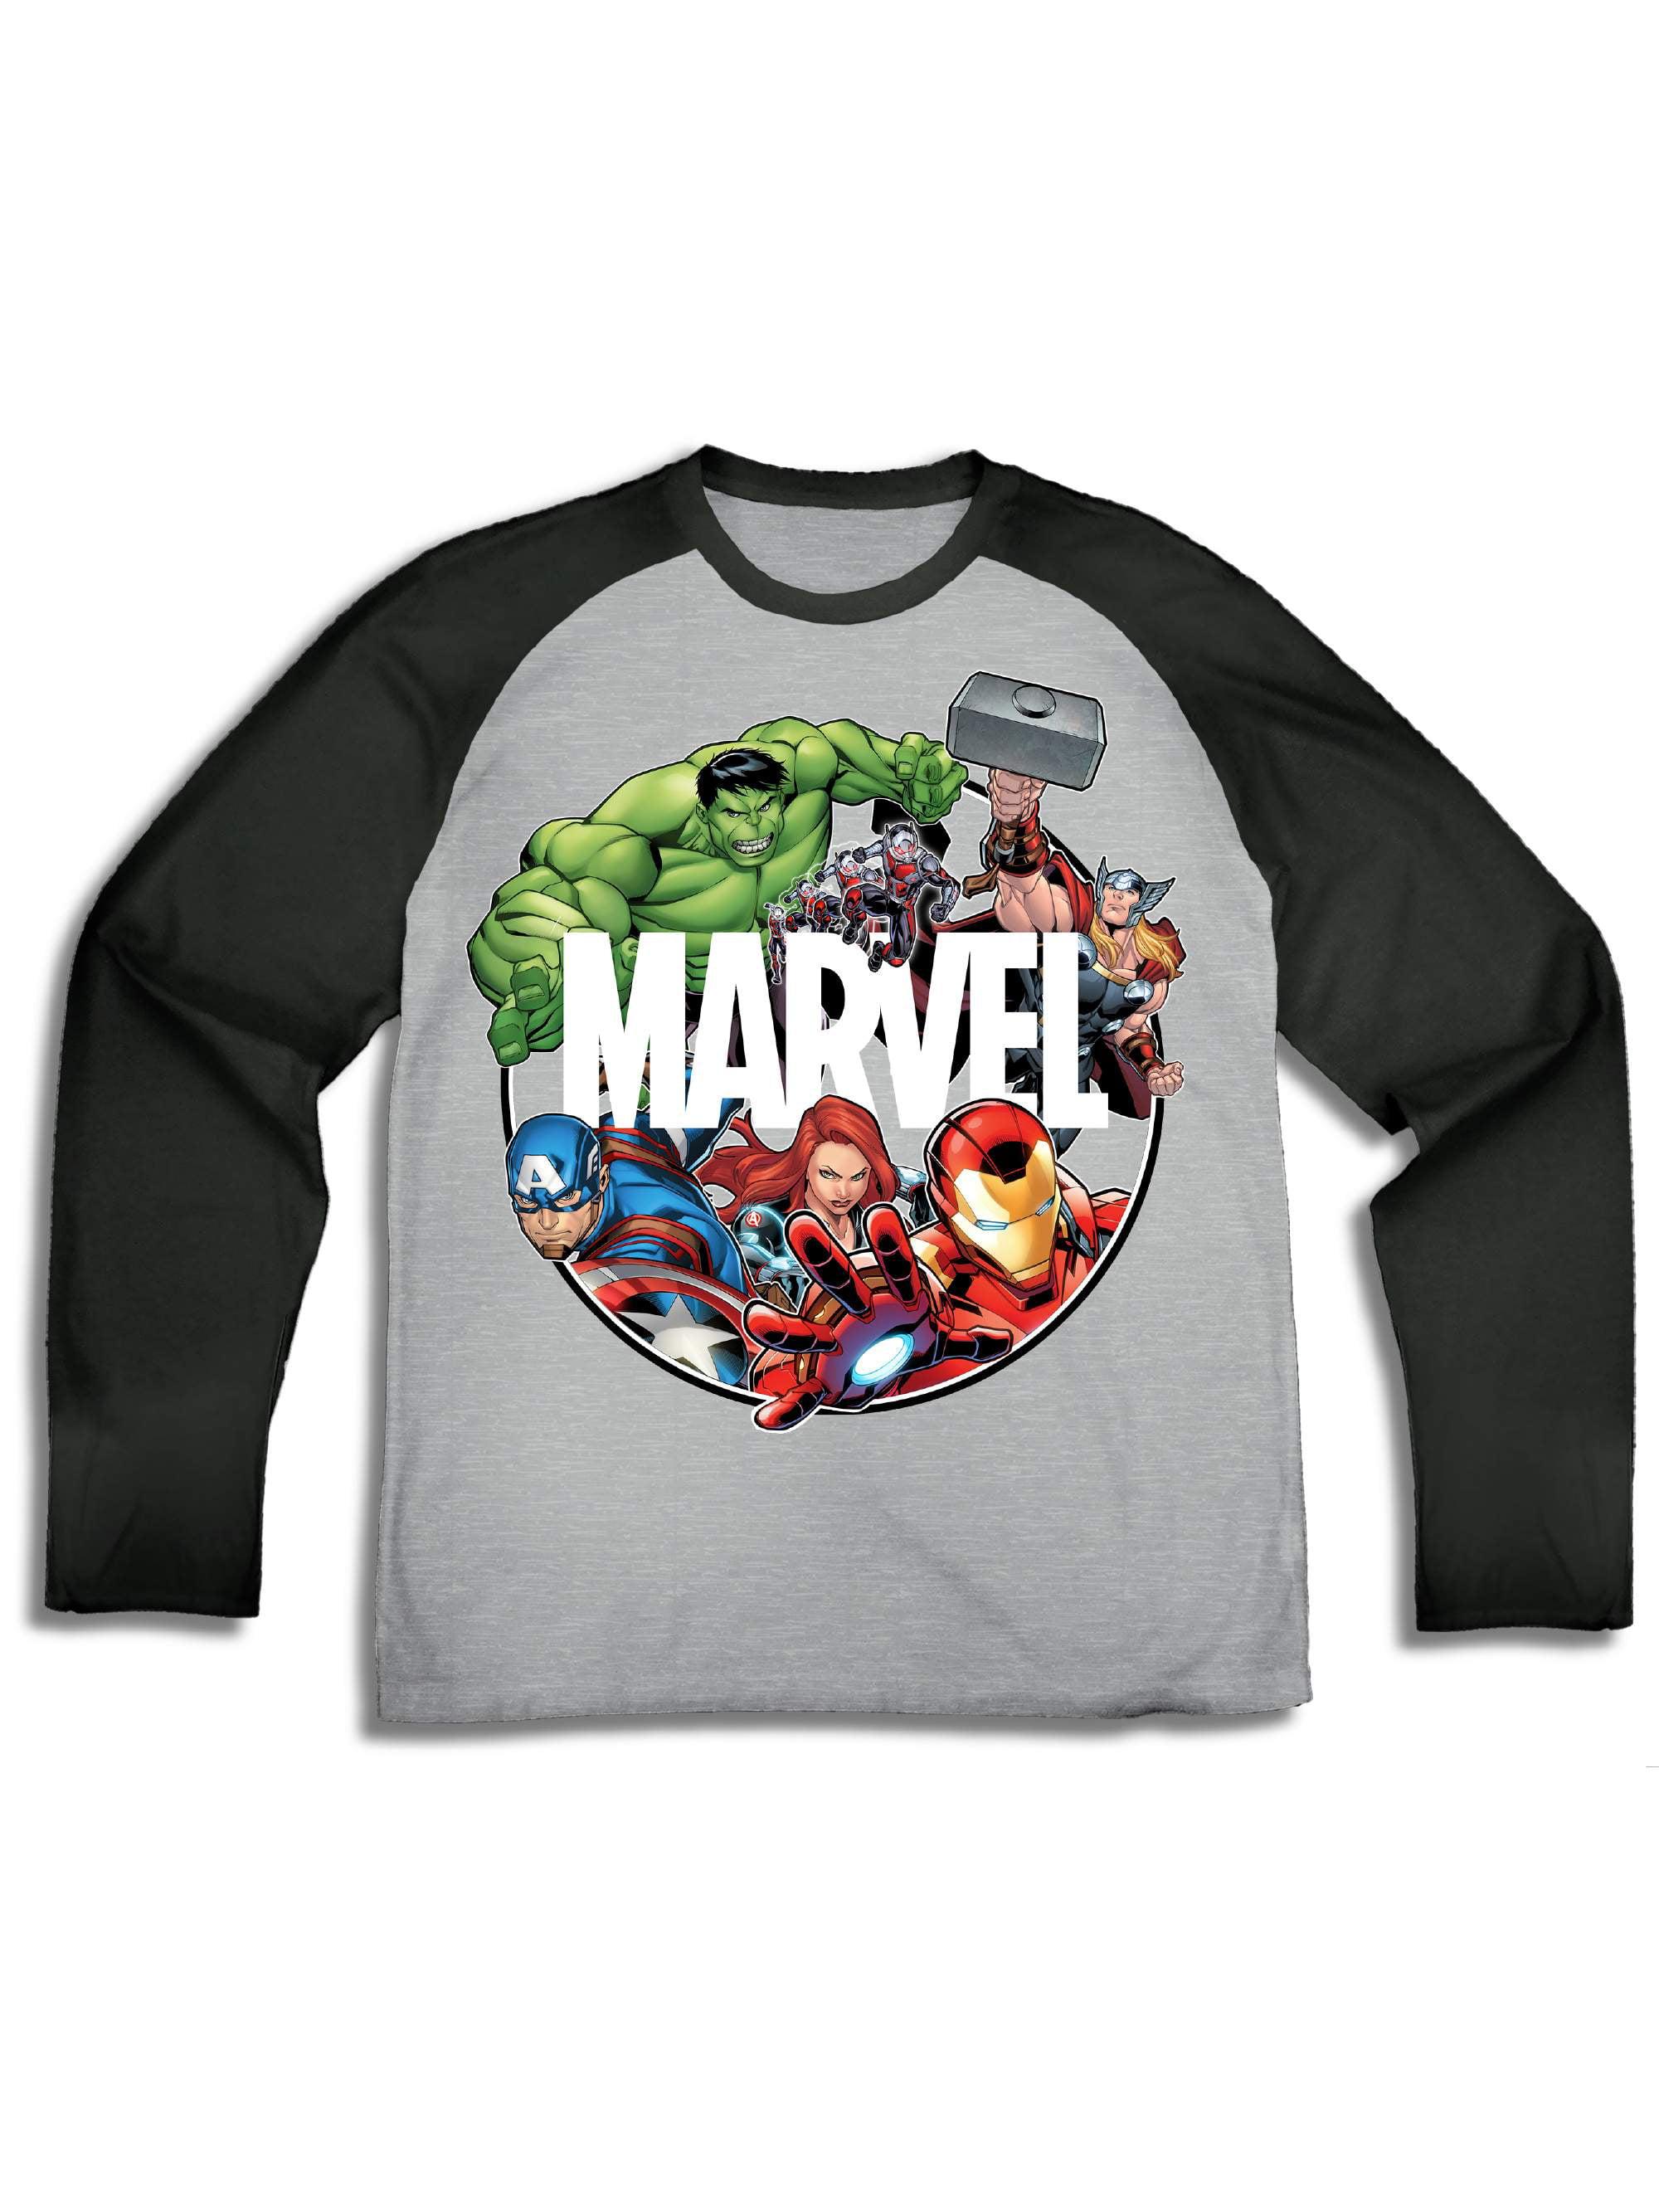 54fdbcfcbfe7 Marvel - Long Sleeve Raglan Graphic Tee (Little Boys   Big Boys) -  Walmart.com